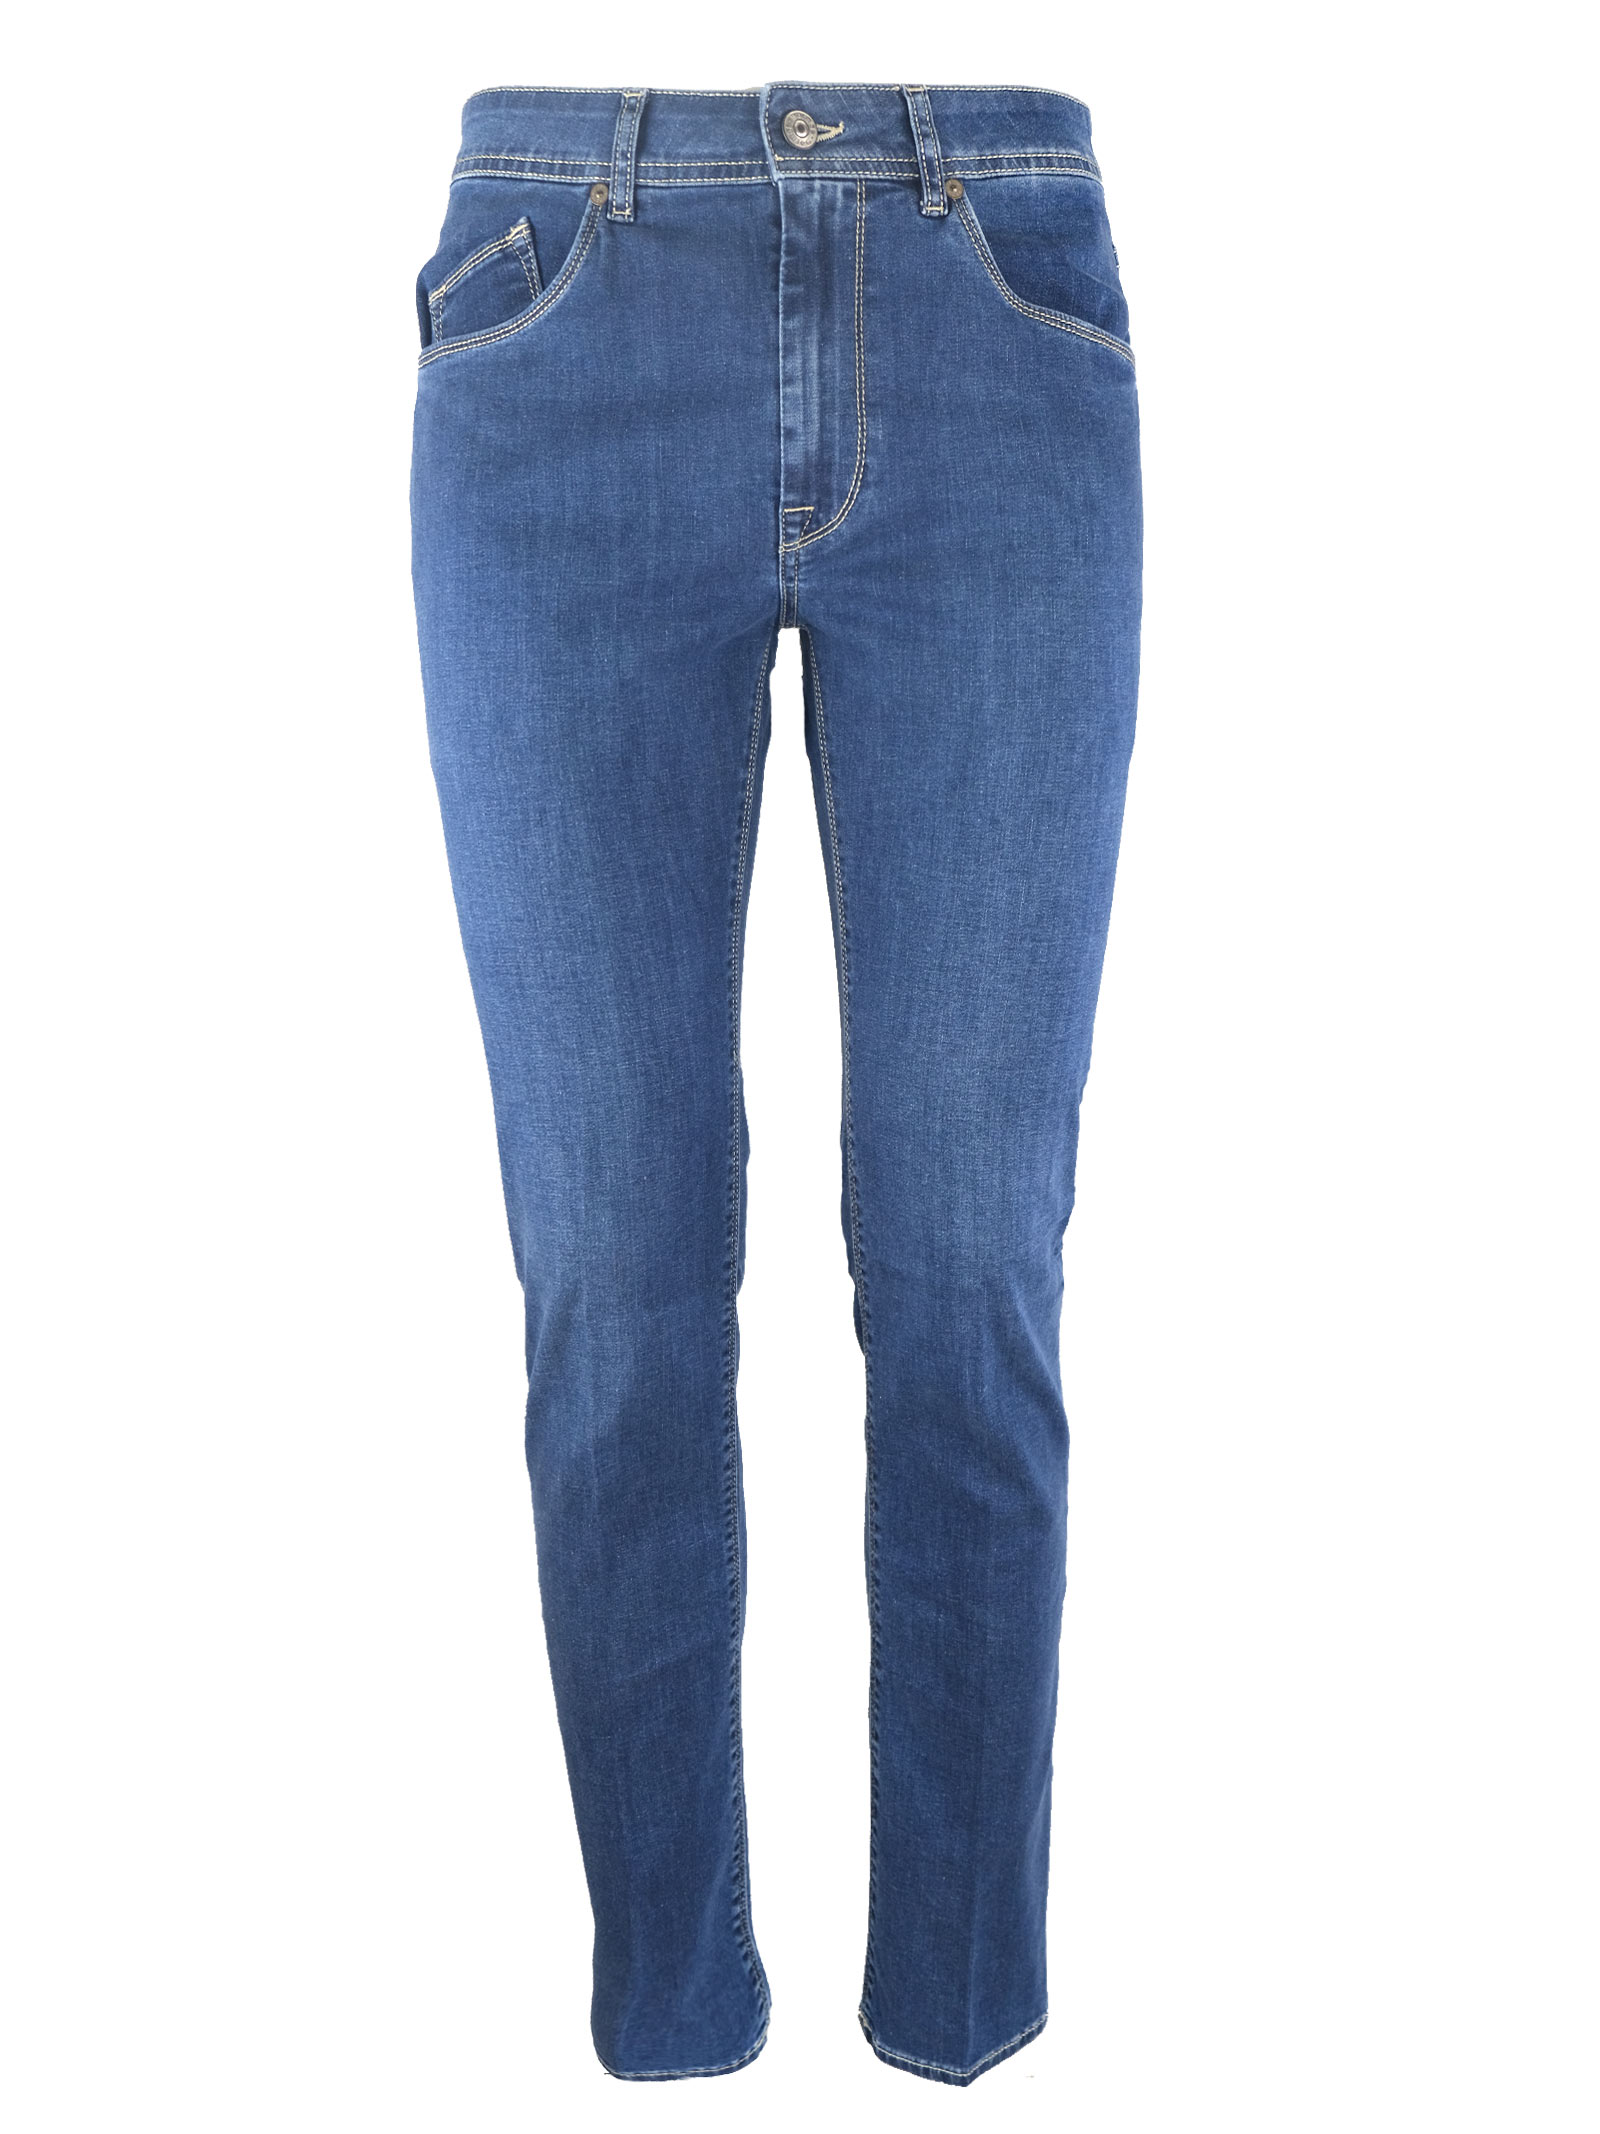 JEANS IN TELA DENIM  8 ONCE BARMAS | Jeans | DEANB025 L017